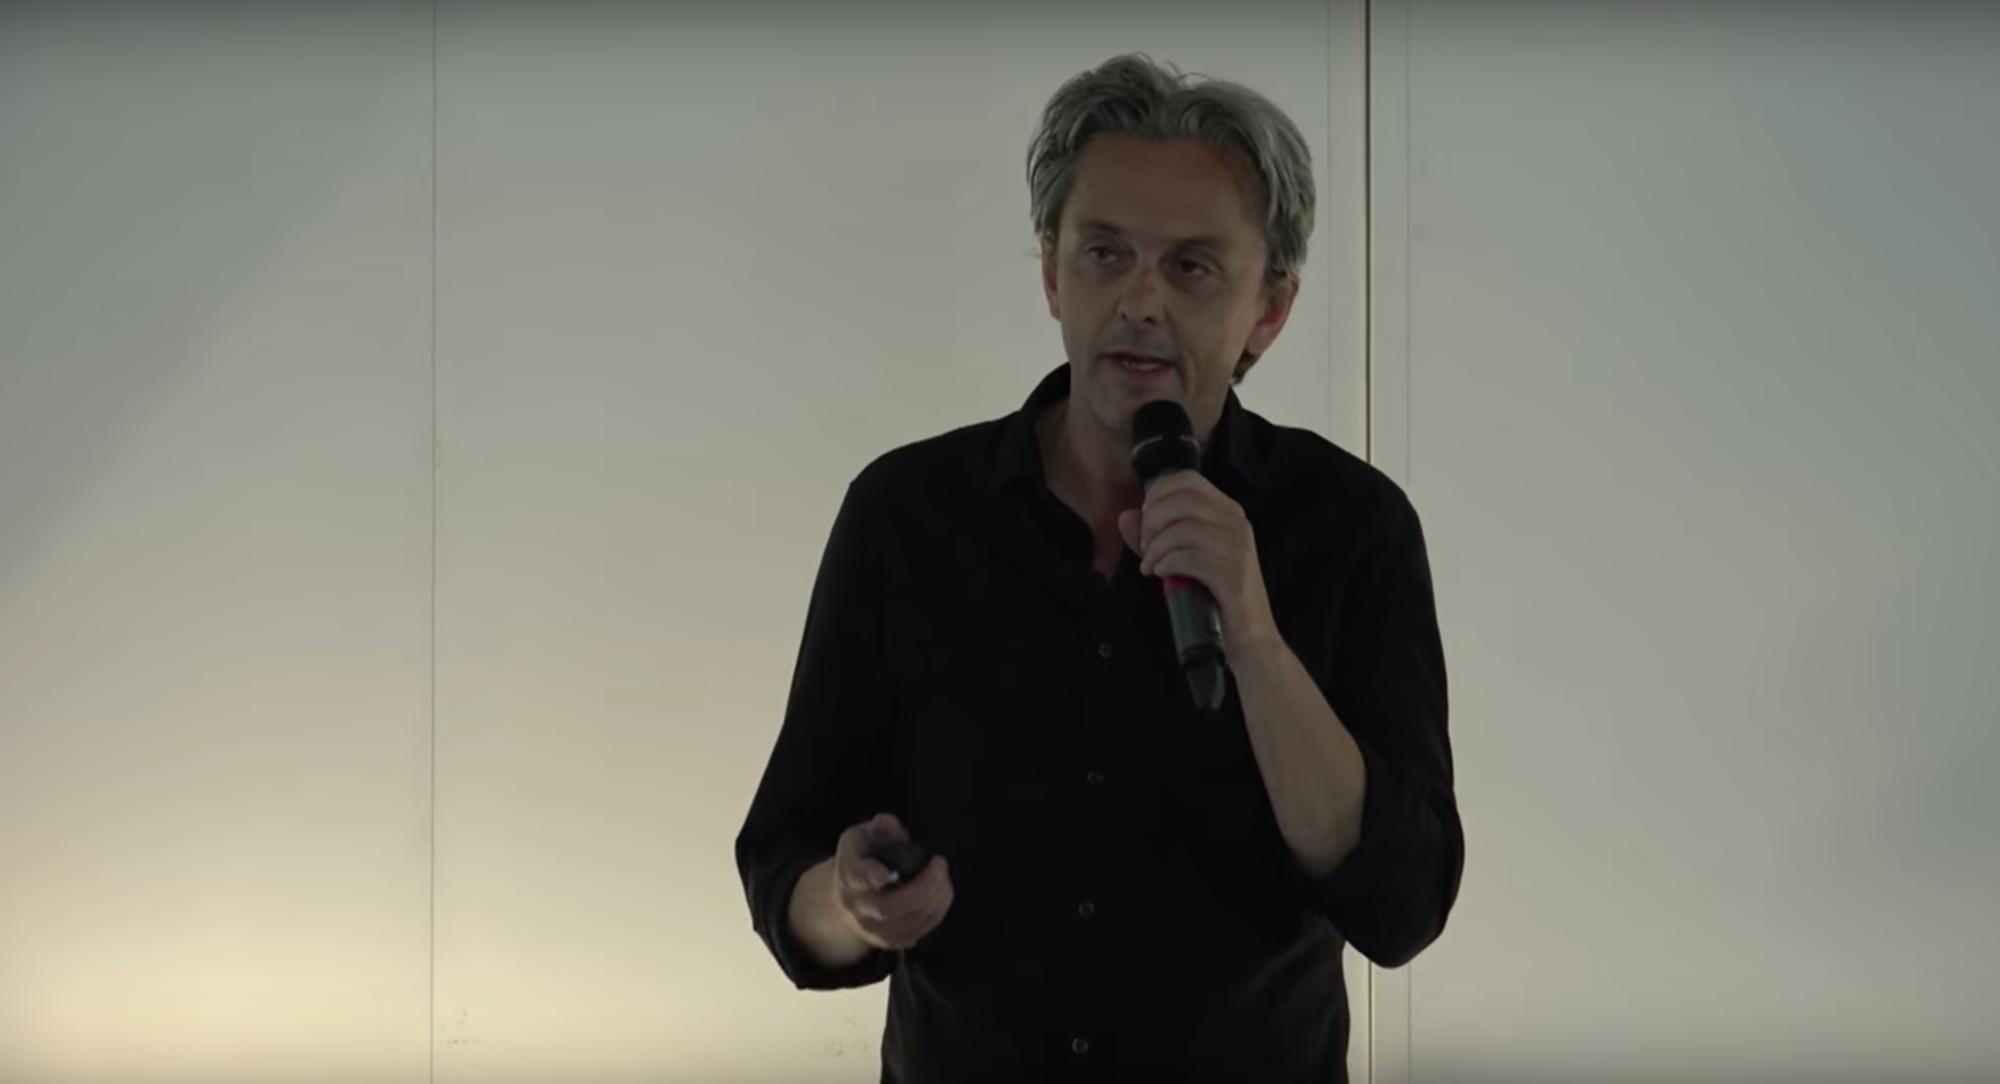 Palestra TEDx com o urbanista Mikael Colville-Andersen: A cidade de tamanho natural